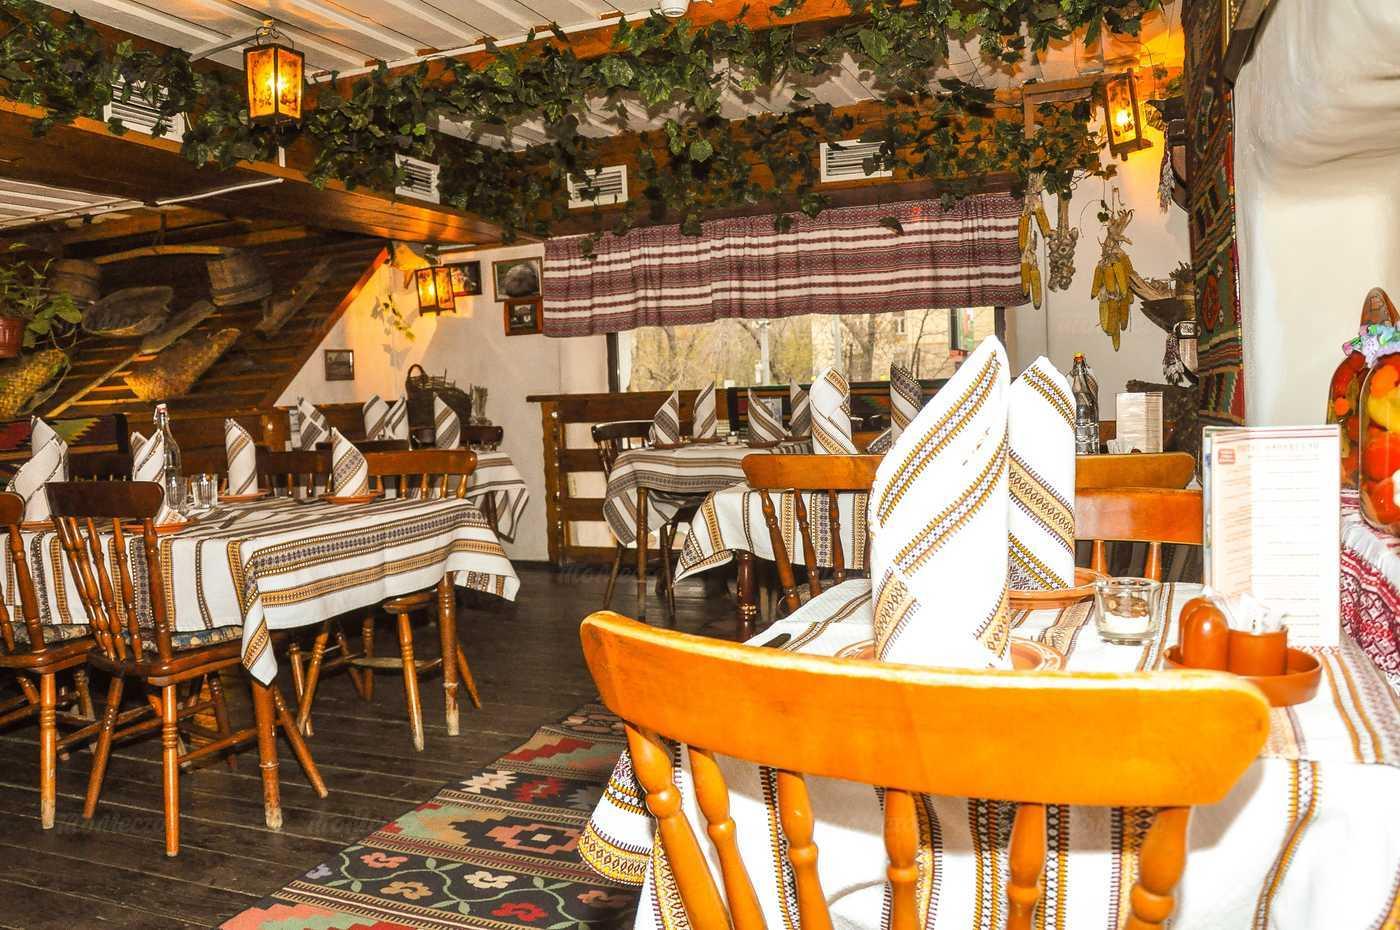 Меню ресторана Корчма Тарас Бульба на Велозаводской улице